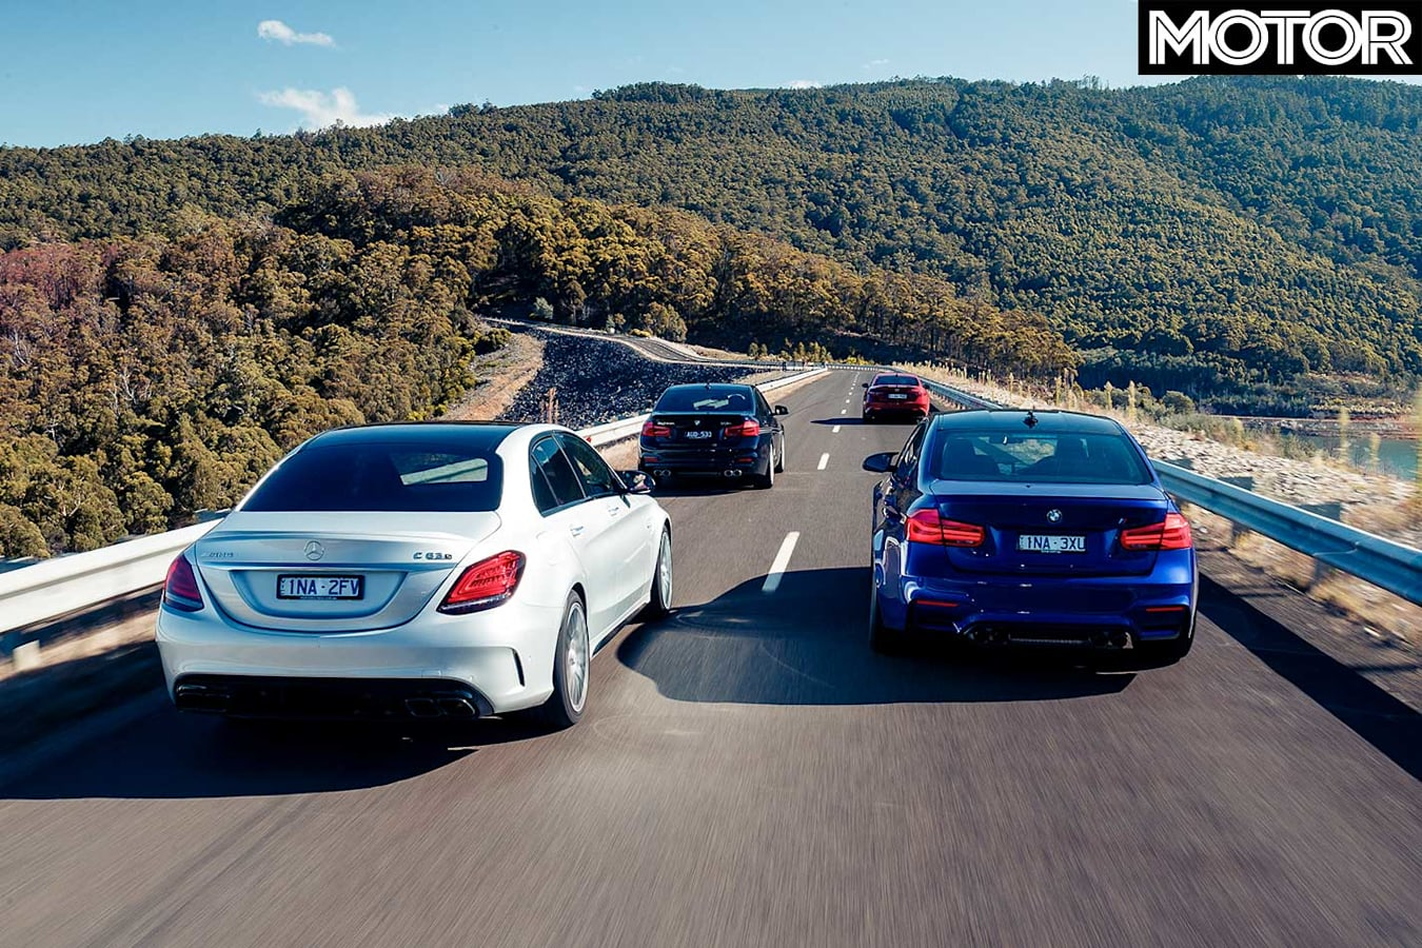 2019 Mercedes AMG C 63 S Vs Audi RS 5 Sportback Vs BMW M 3 Pure Vs Alfa Romeo Giulia Q Vs Alpina B 3 S Comparison Drive Rear Jpg